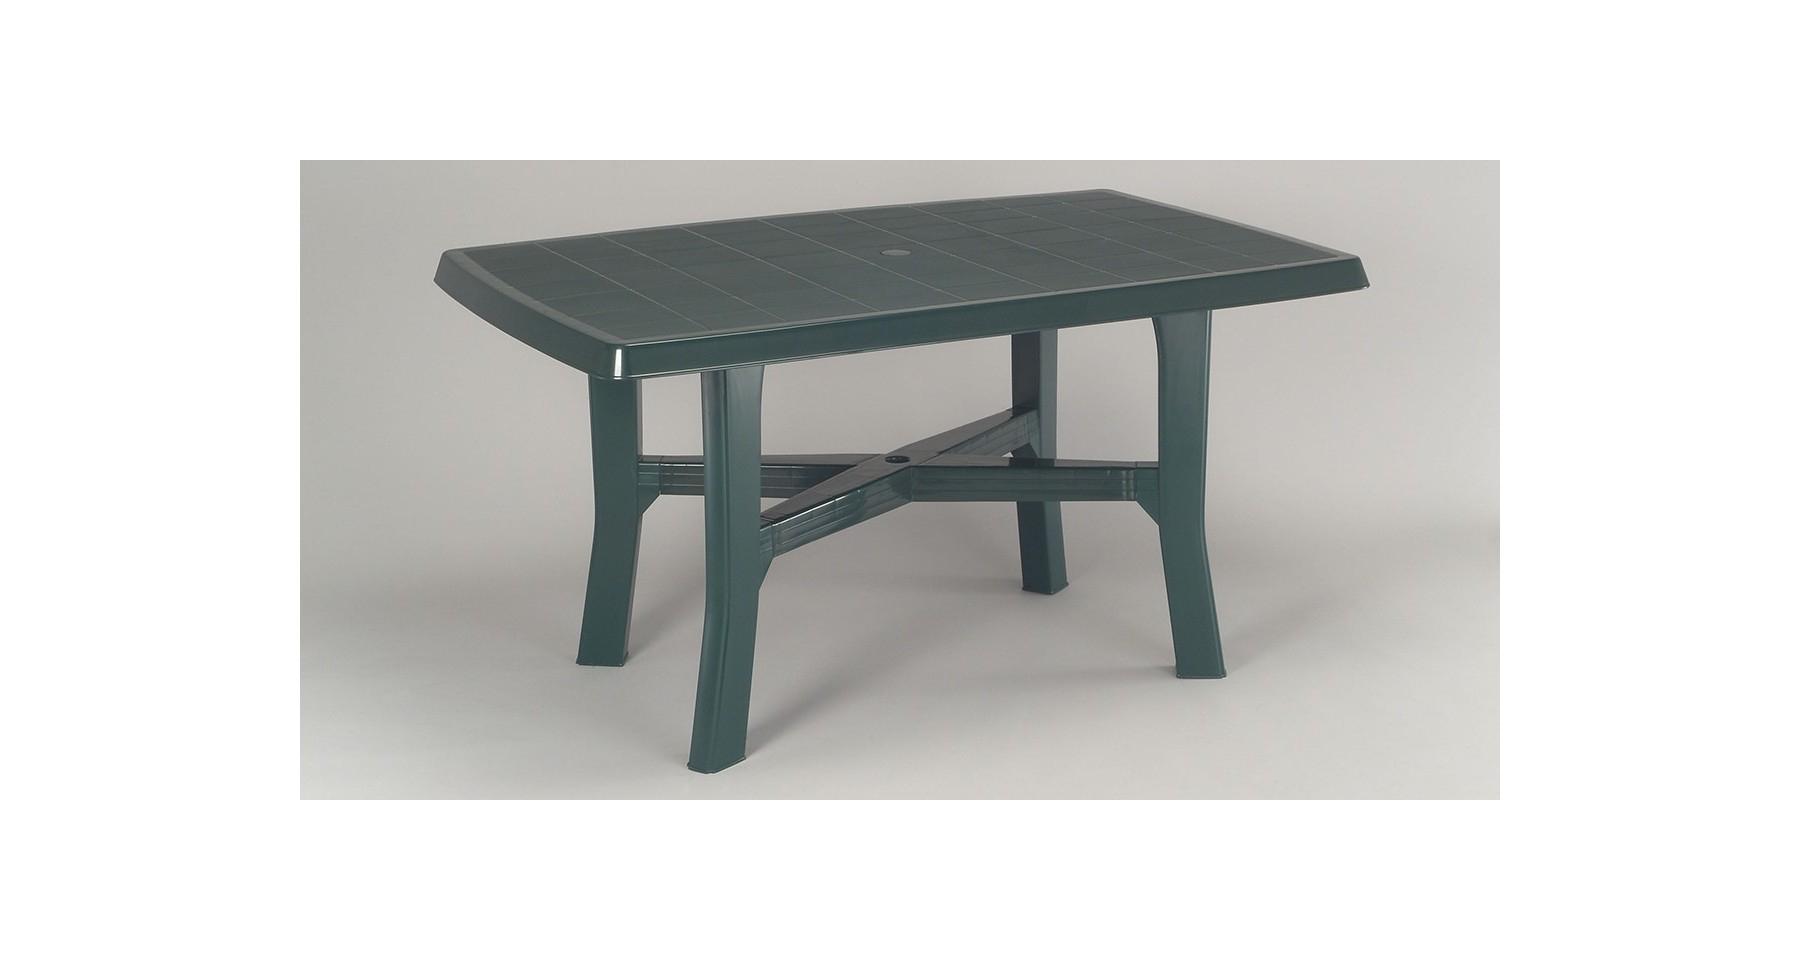 Table De Jardin En Rã©Sine Table De Jardin Verte En Résine ... destiné Table De Jardin Verte